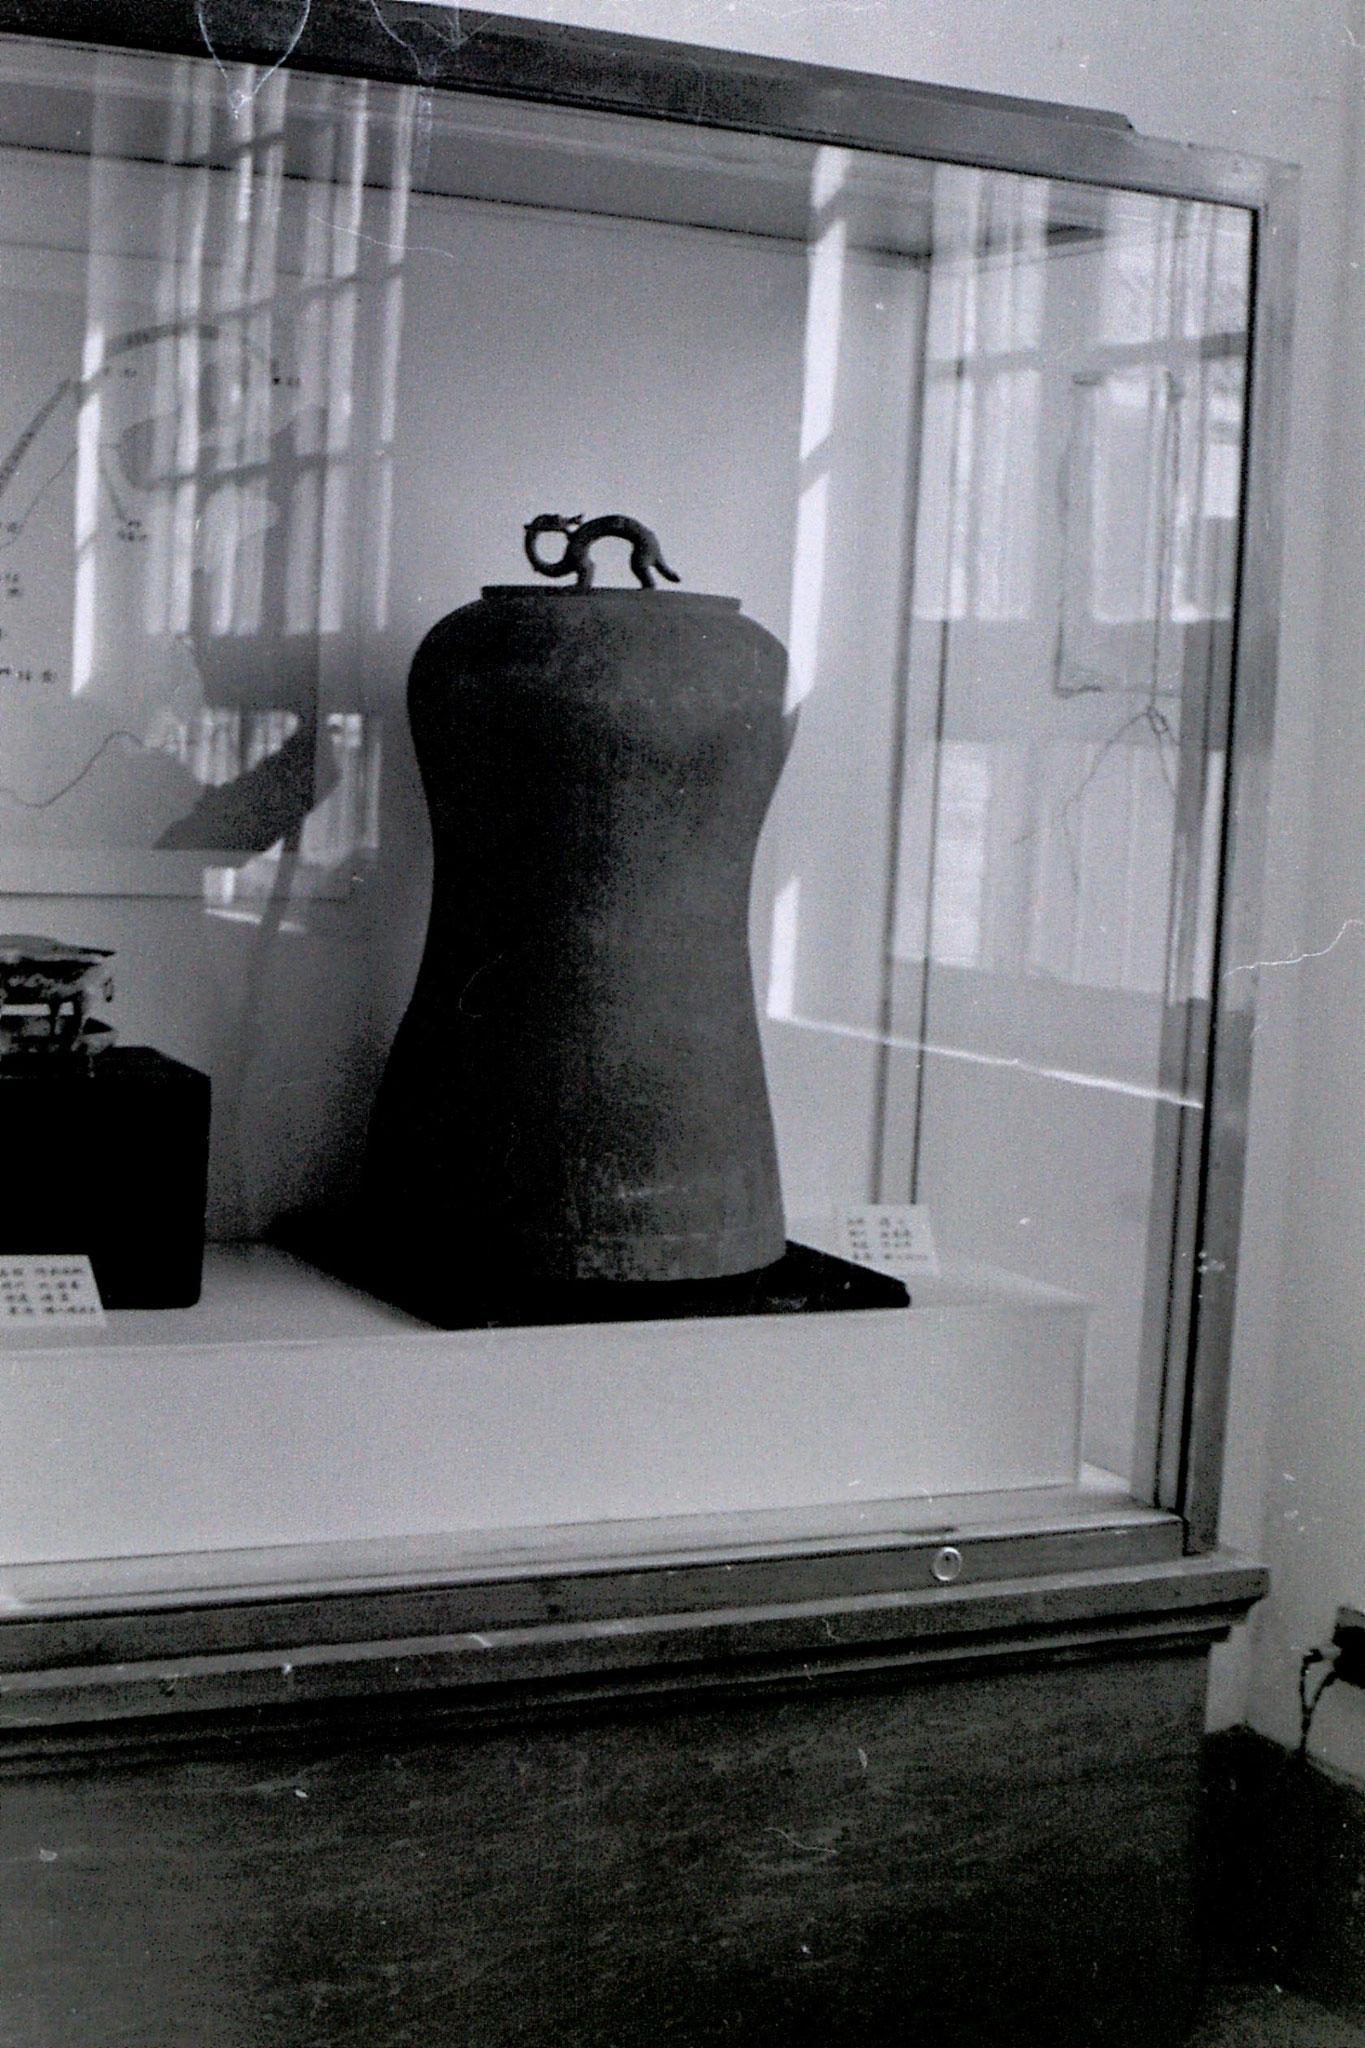 7/3/1989: 24: Xianyang museum bell